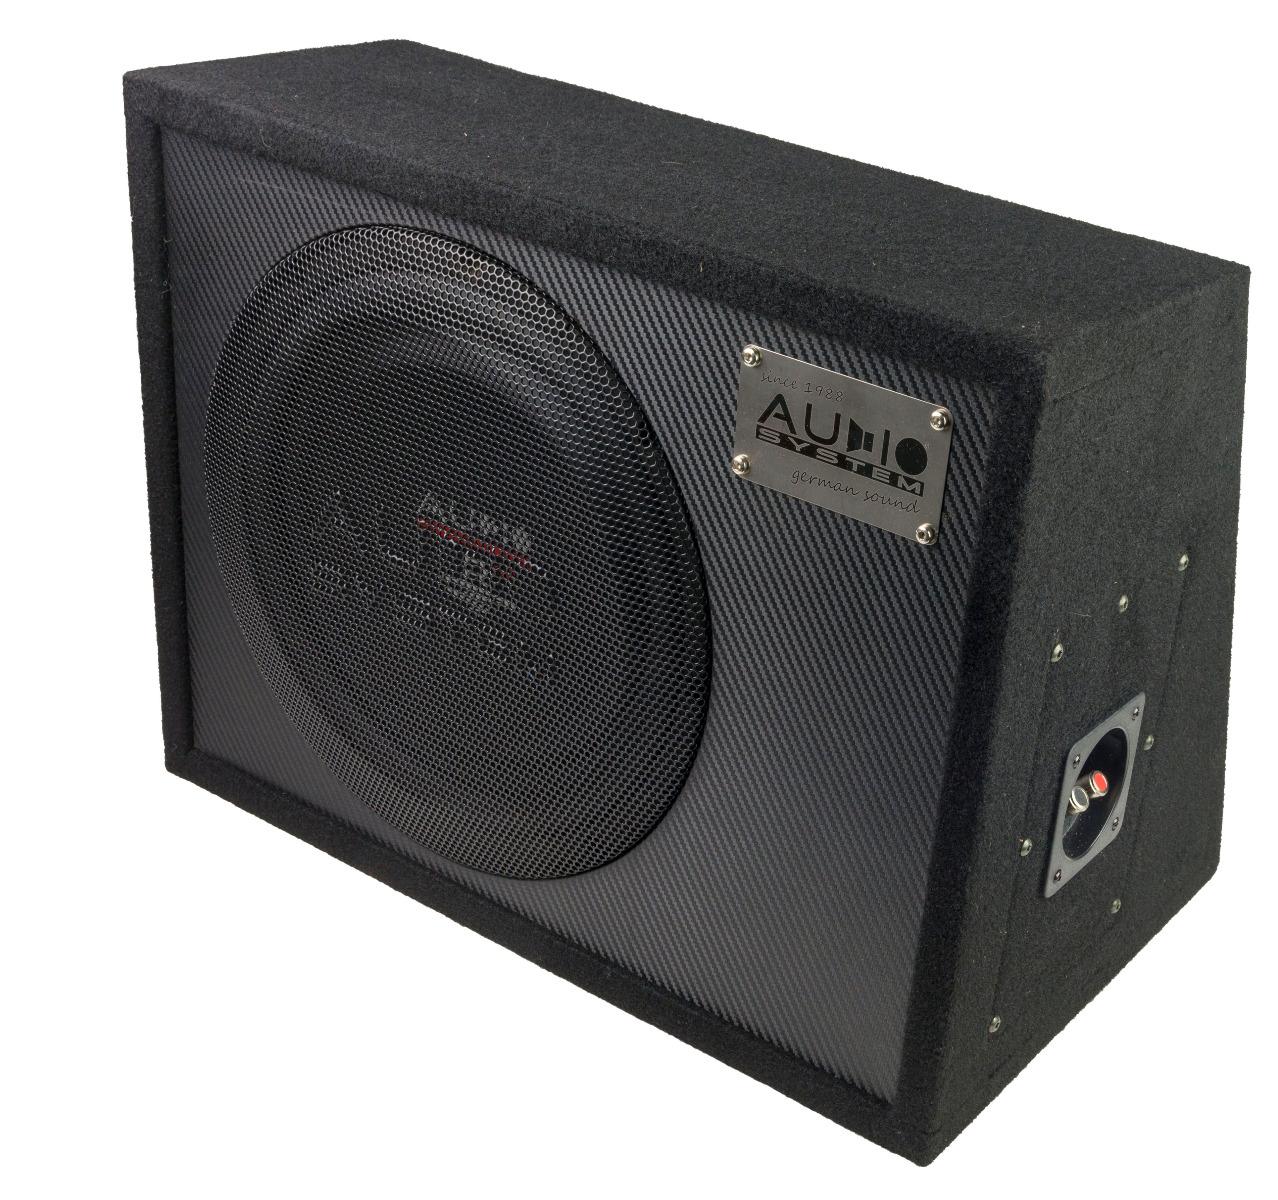 Audio System R 10 FLAT EVO G 25cm Subwoofer geschlossene Subwooferbox RADION SERIES EVO HIGH EFFICIENT